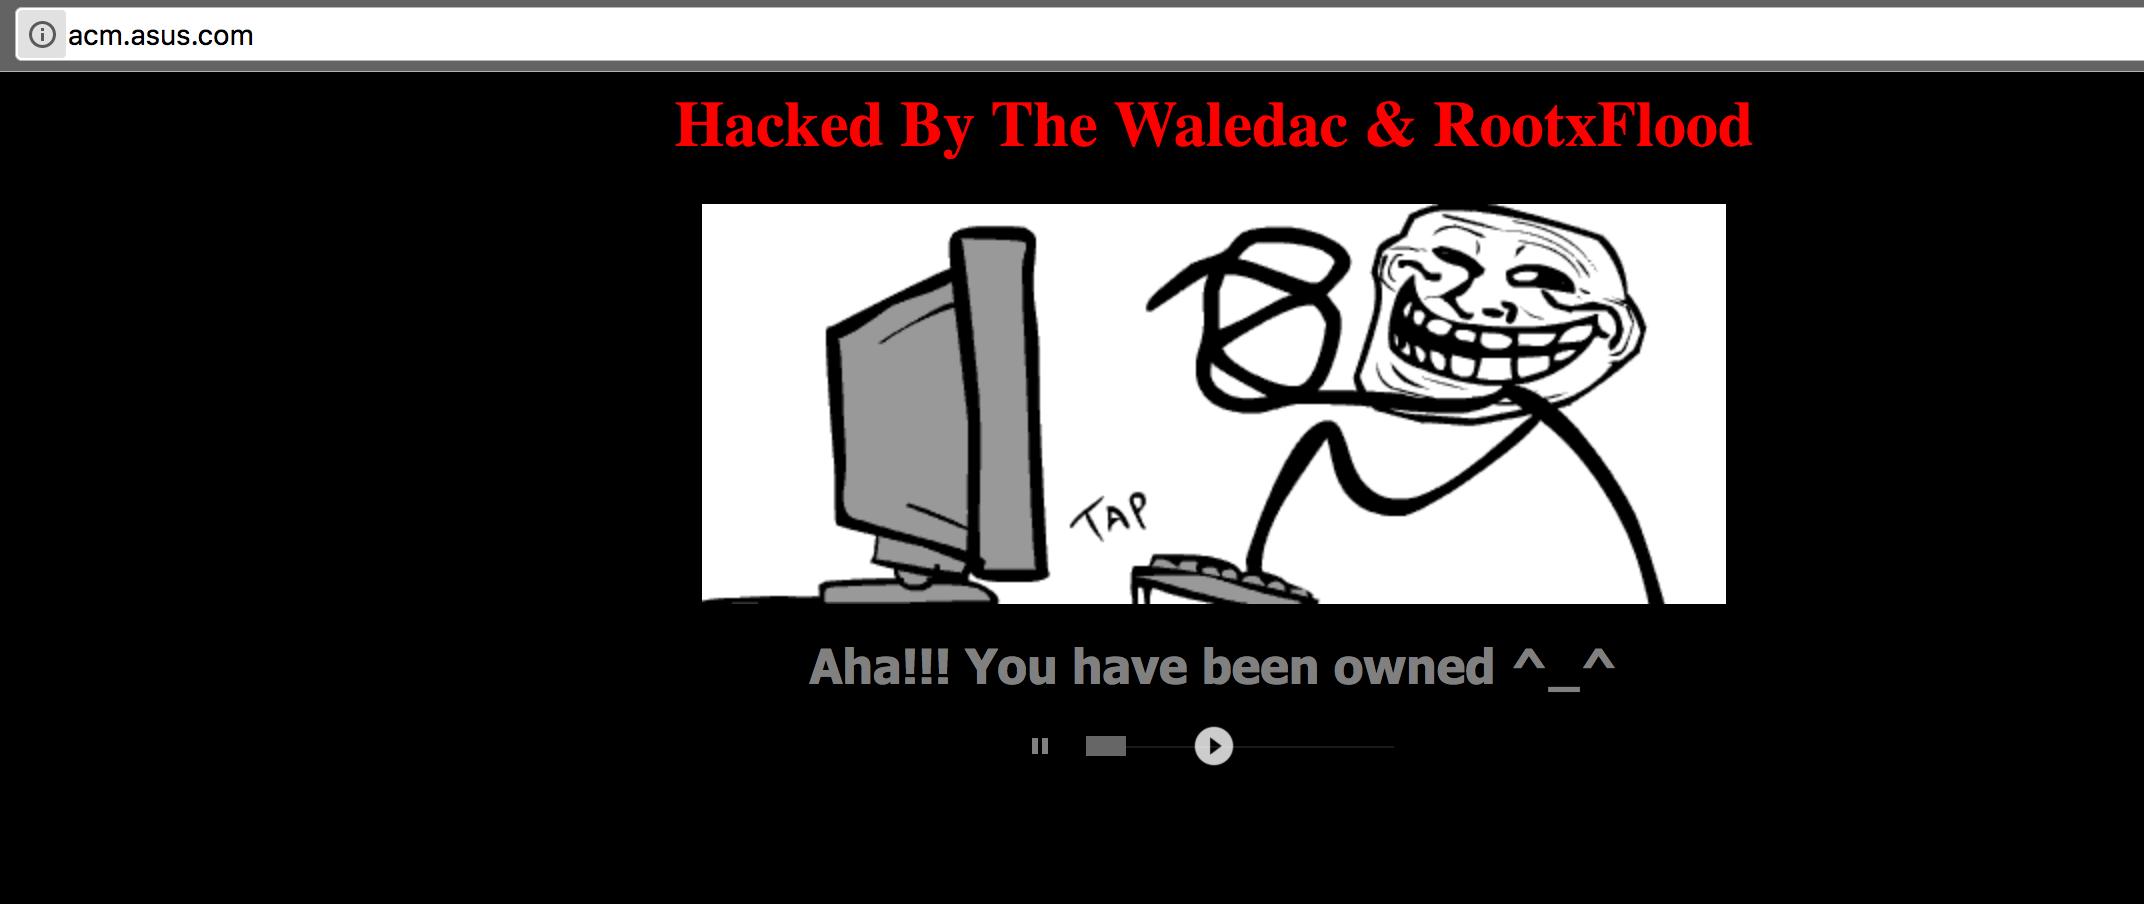 Asus ACM Backend We login Hacked